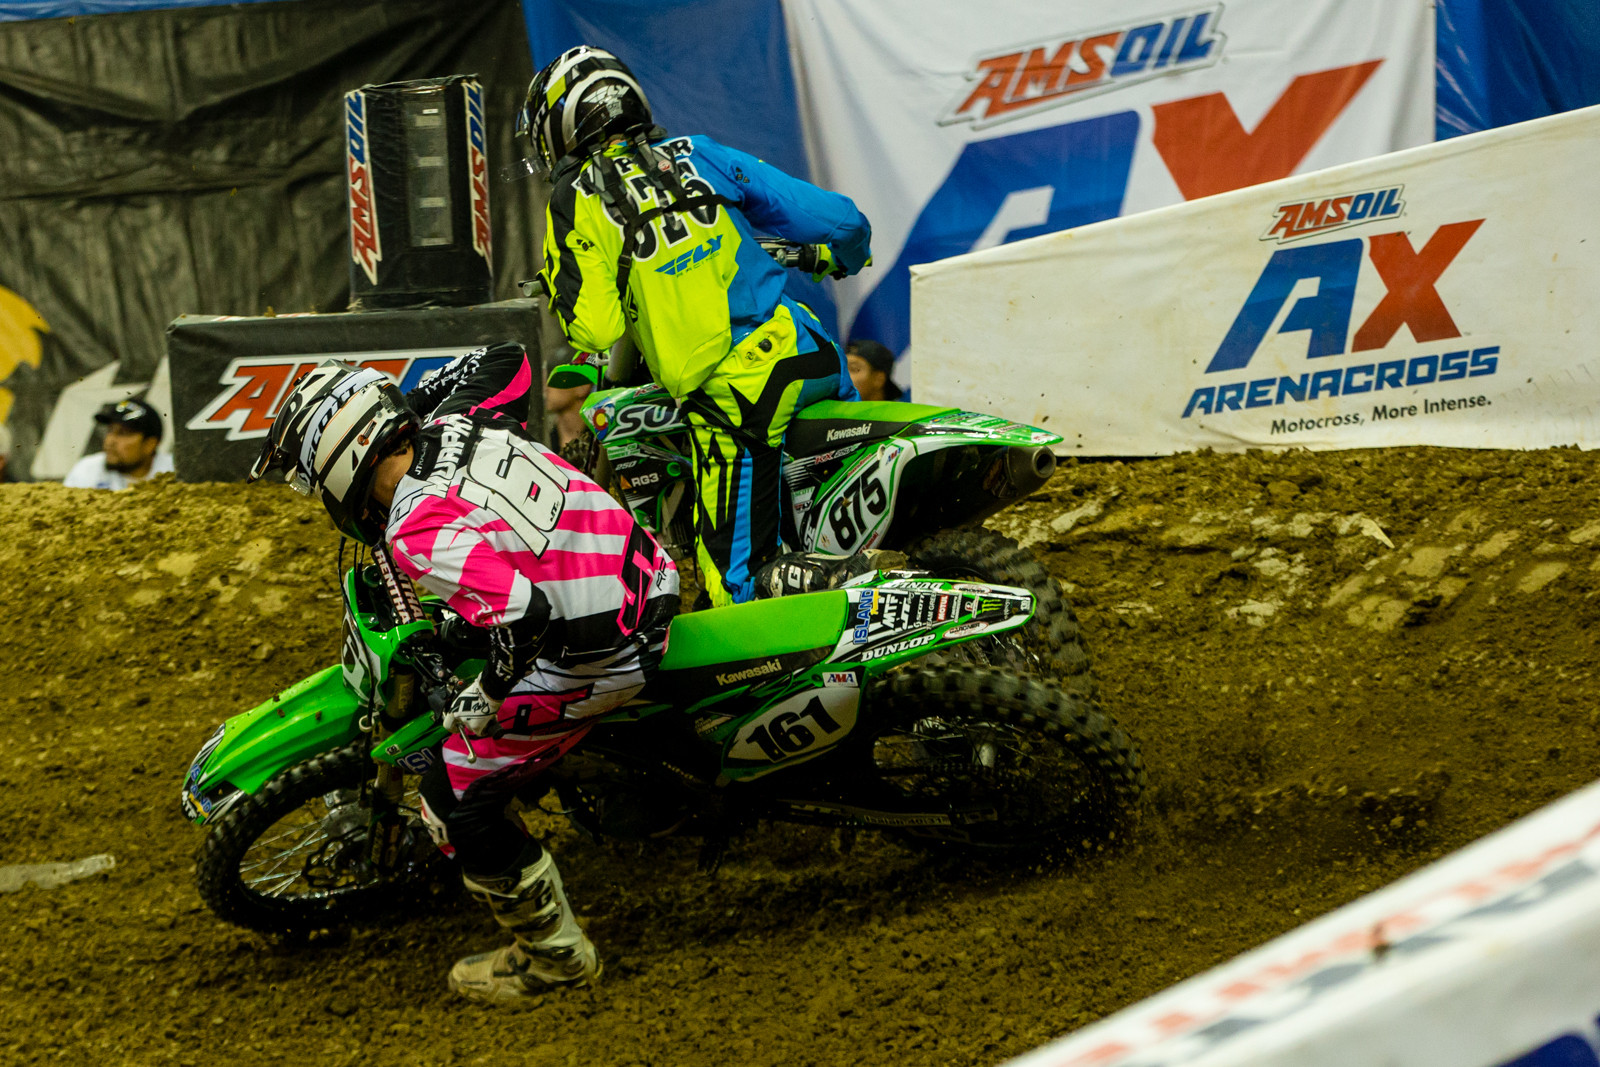 Arenacross - Photo Gallery: Ontario Arenacross - Saturday Night - Motocross Pictures - Vital MX